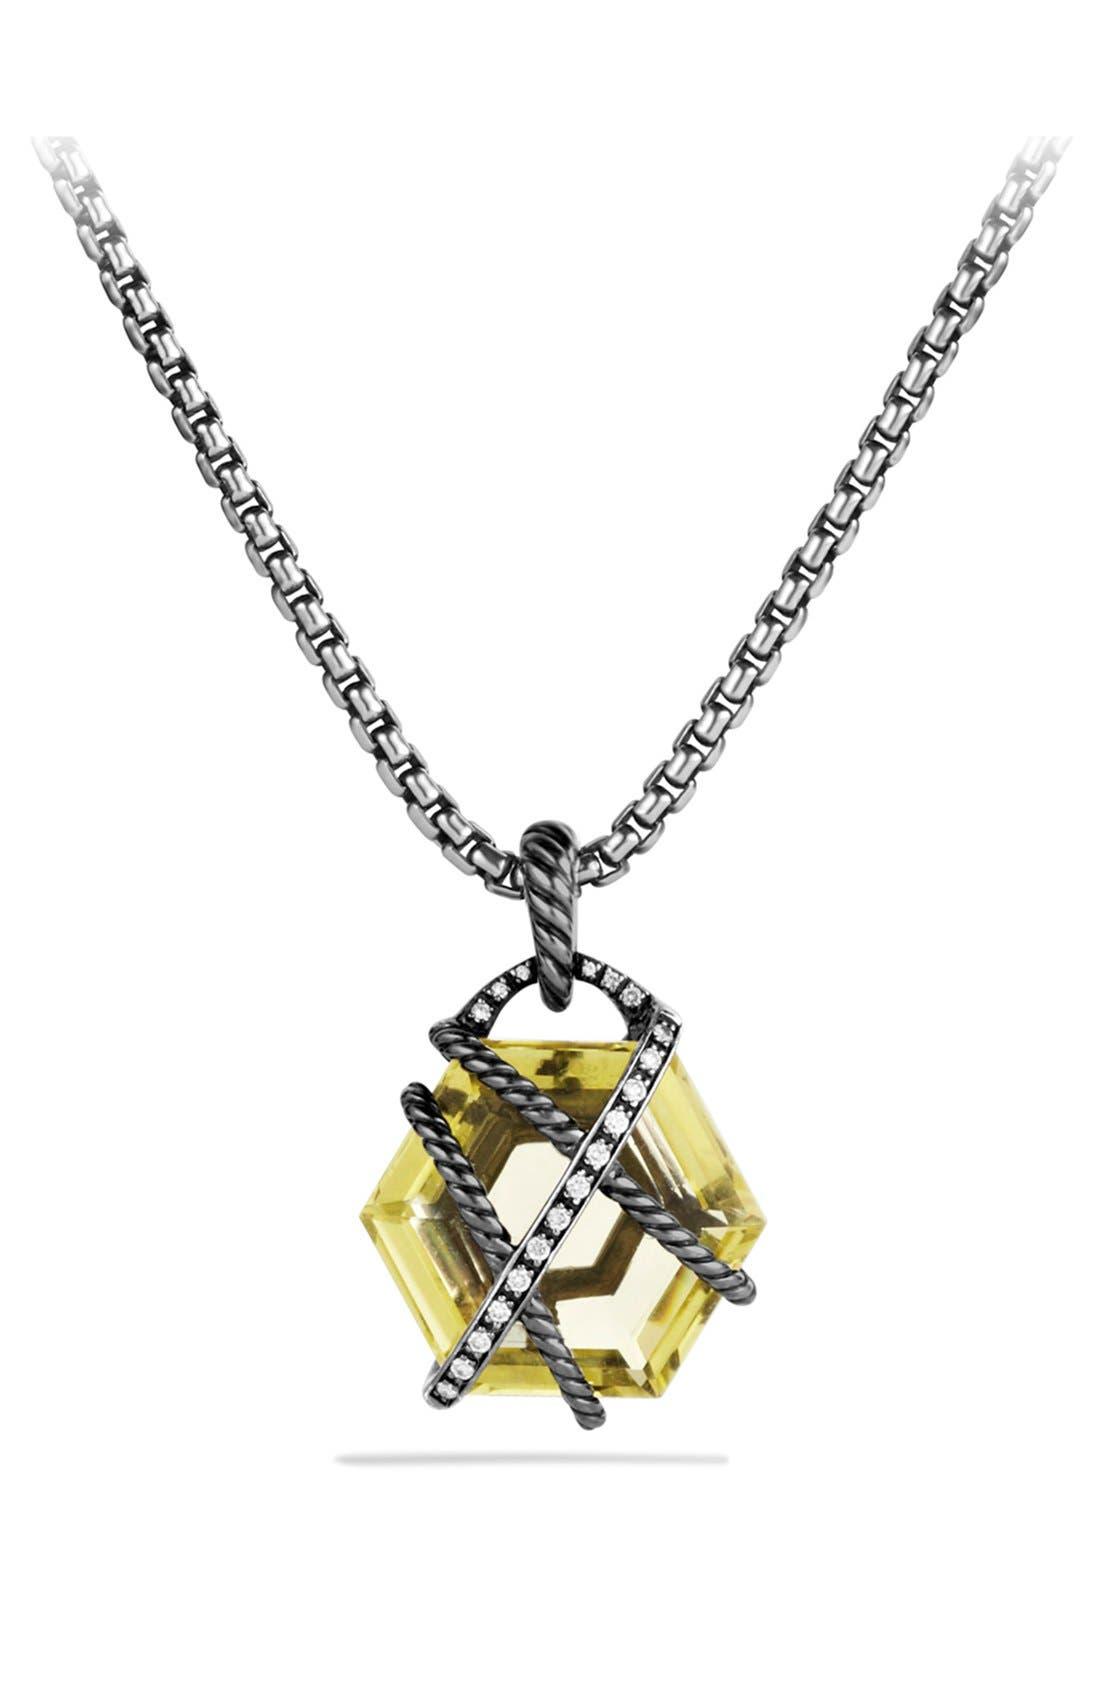 Alternate Image 1 Selected - David Yurman 'Cable Wrap' Pendant with Lemon Citrine and Diamonds